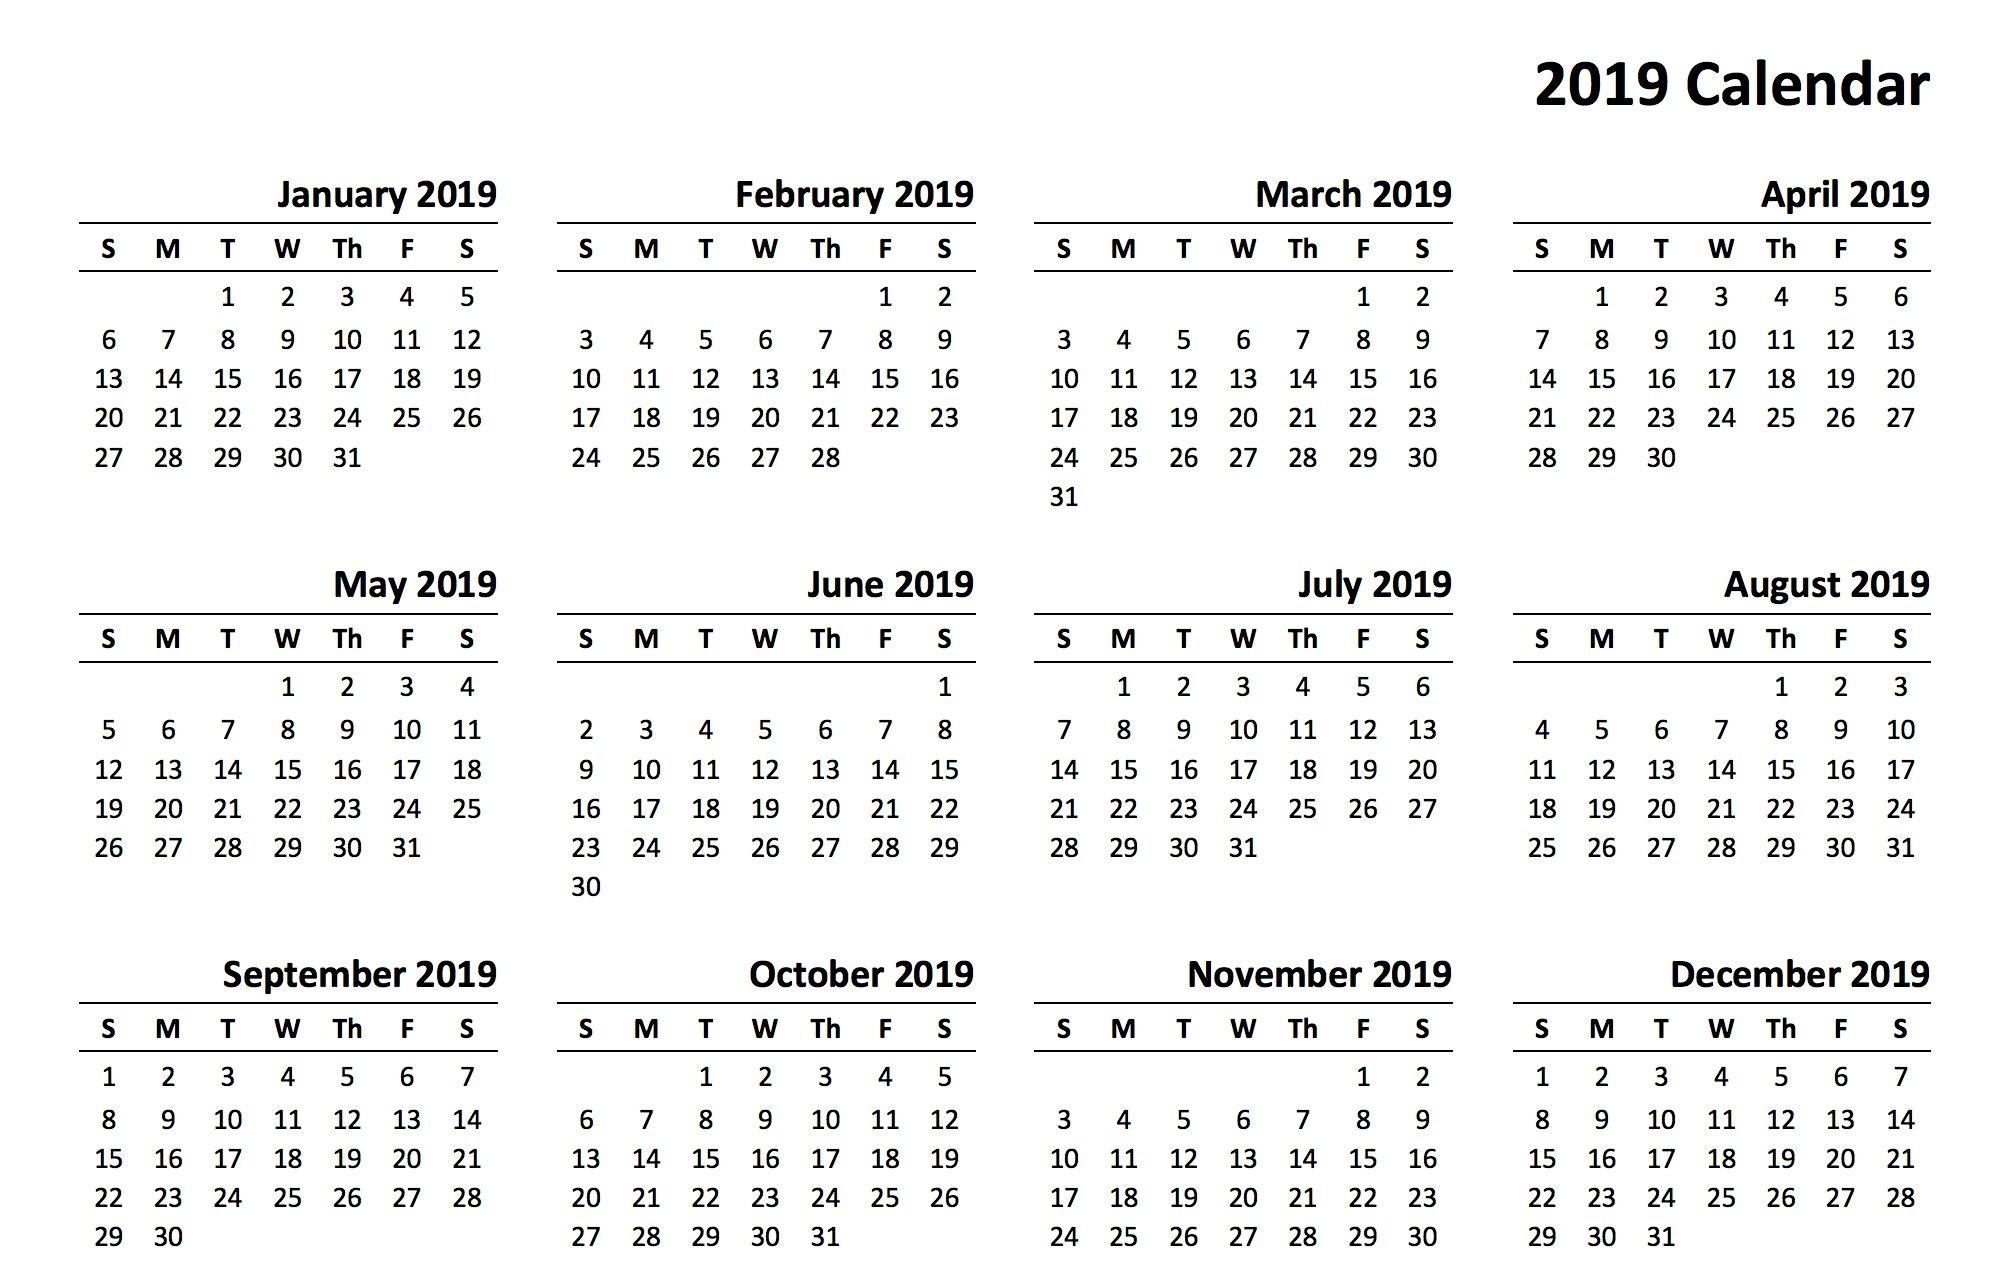 Printable 2019 Calendar   Aaron The Artist 2019 Calendars